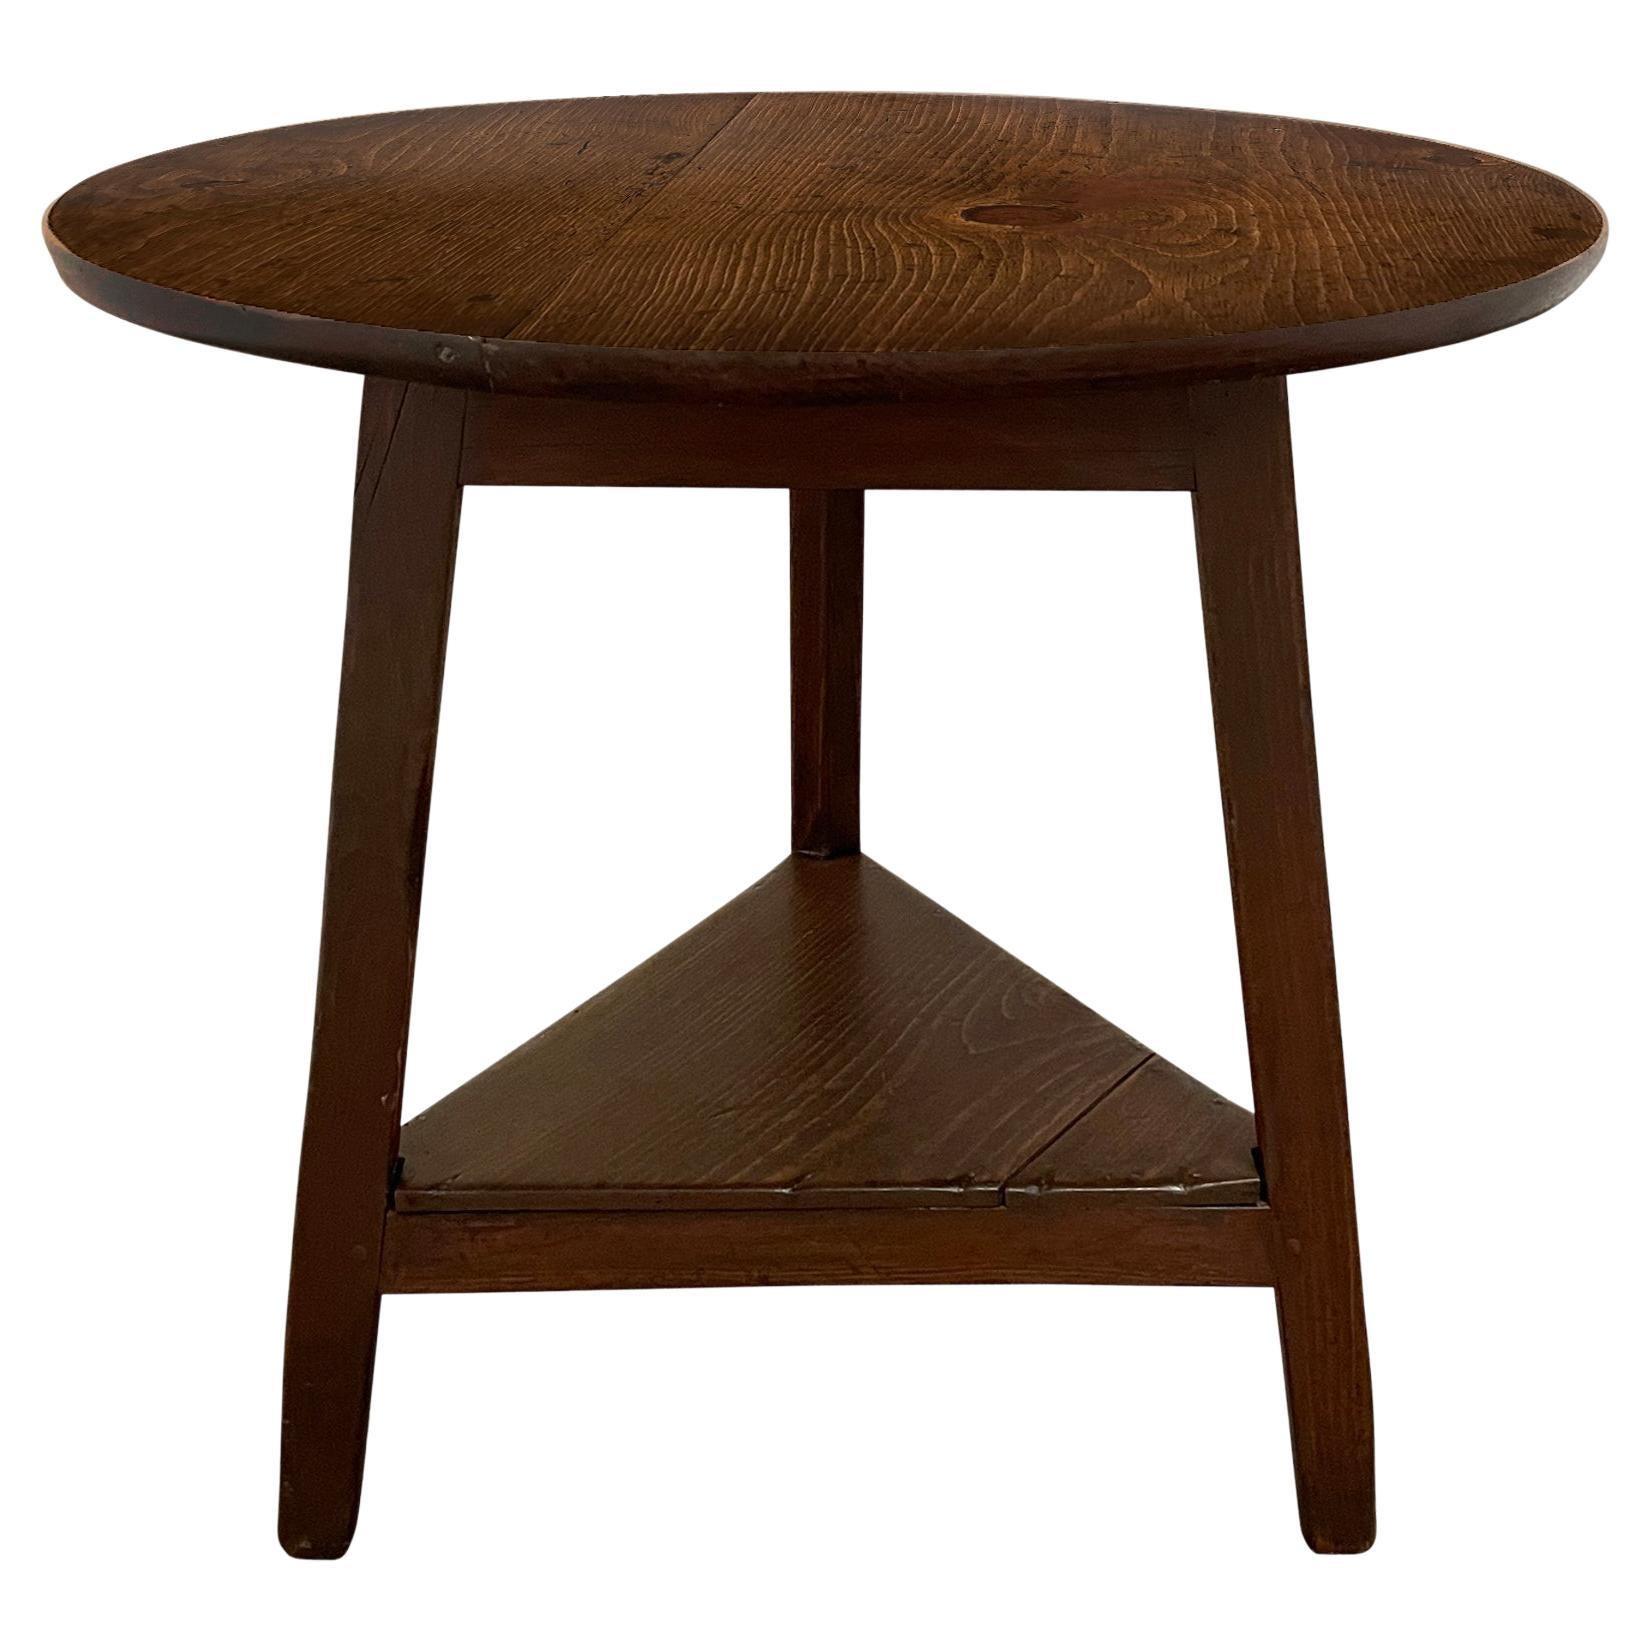 19th Century English Cricket Table